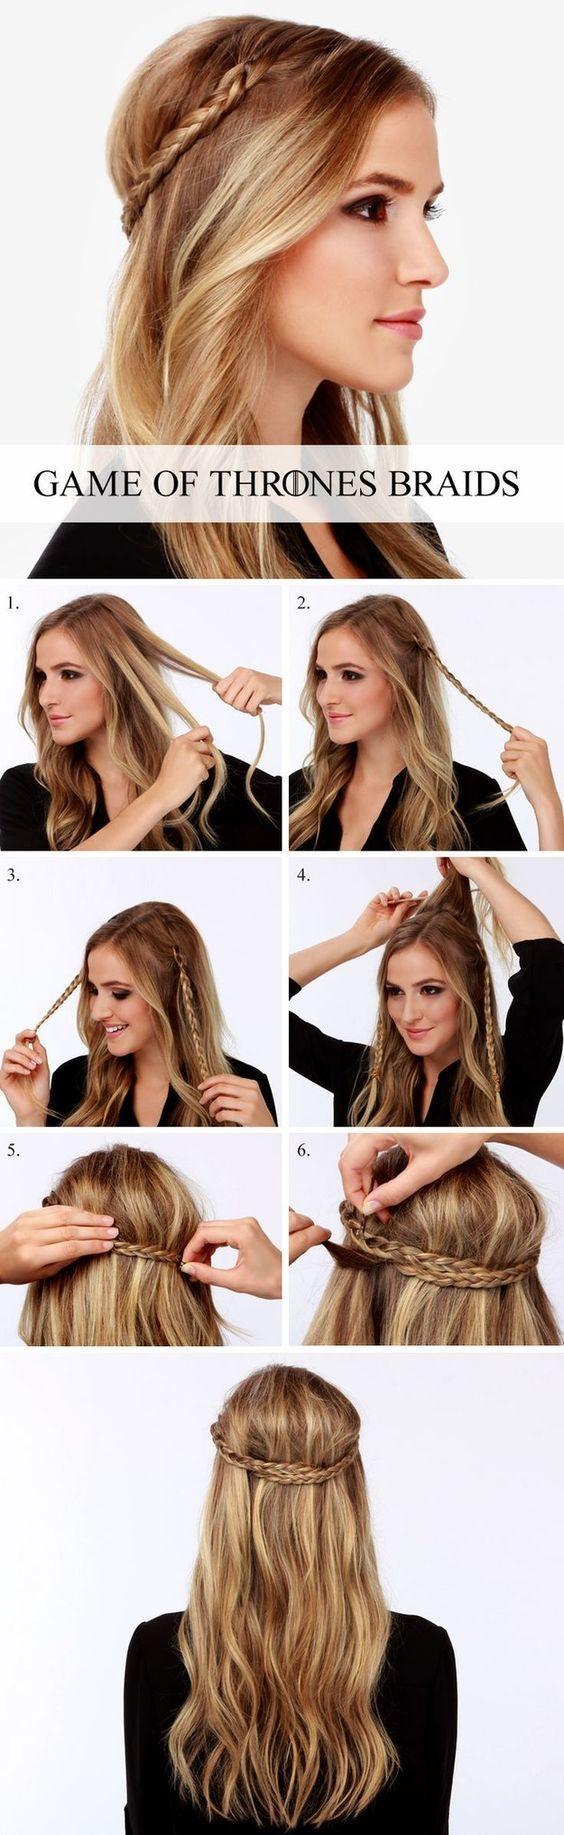 Pretty Braided Crown Hairstyle Tutorials and Ideas / http://www.himisspuff.com/easy-diy-braided-hairstyles-tutorials/39/